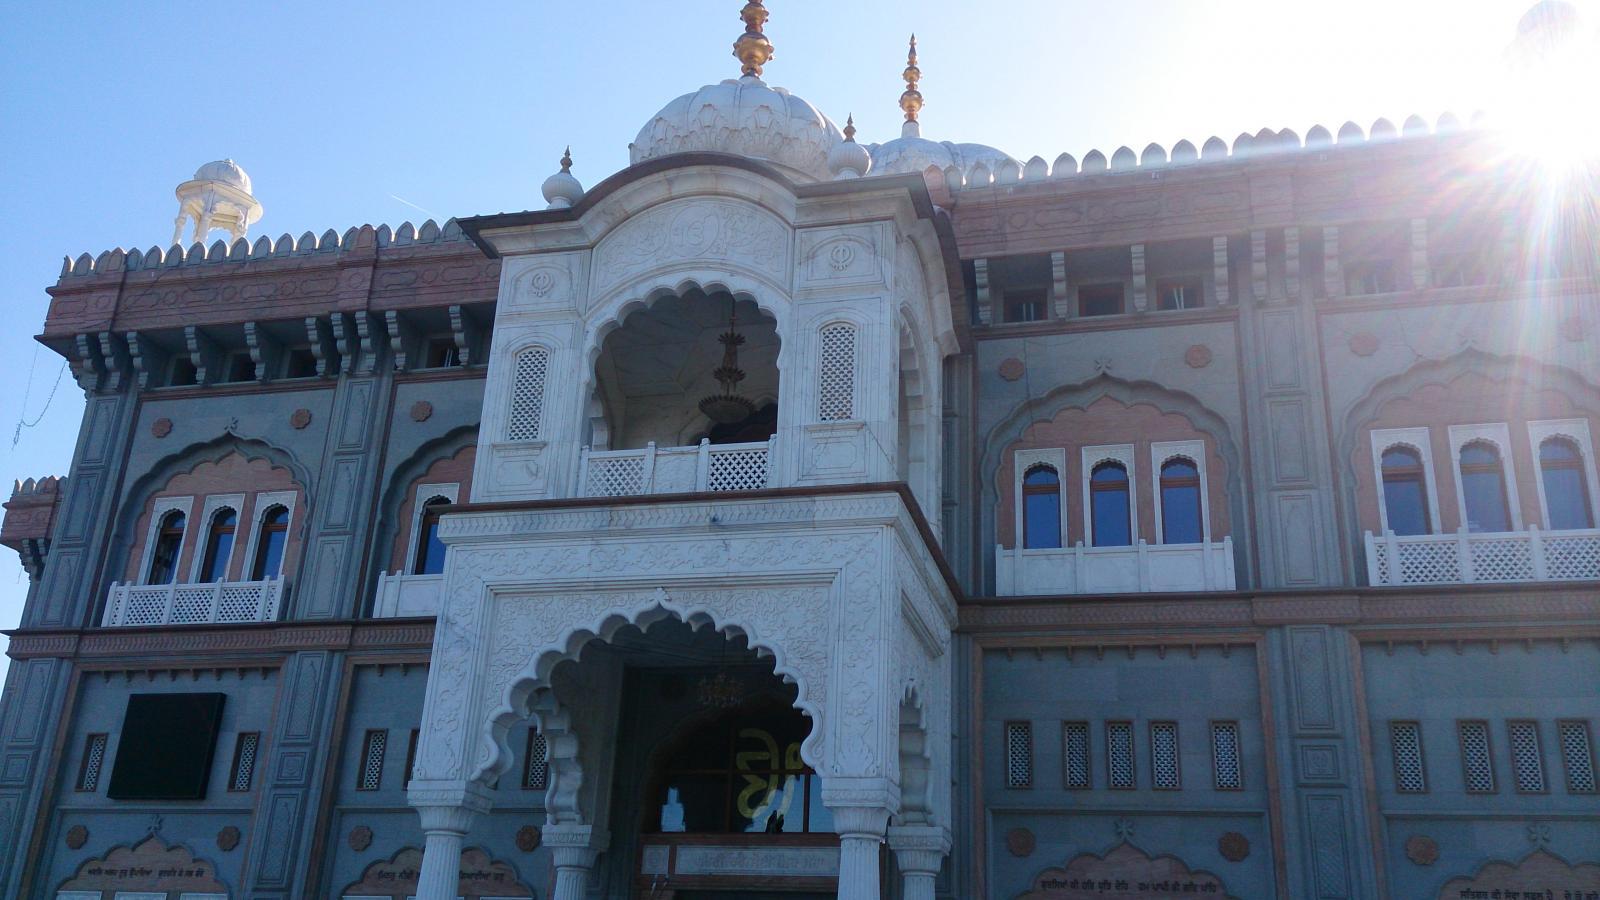 the sri guru nanak darbar gurdwara essay